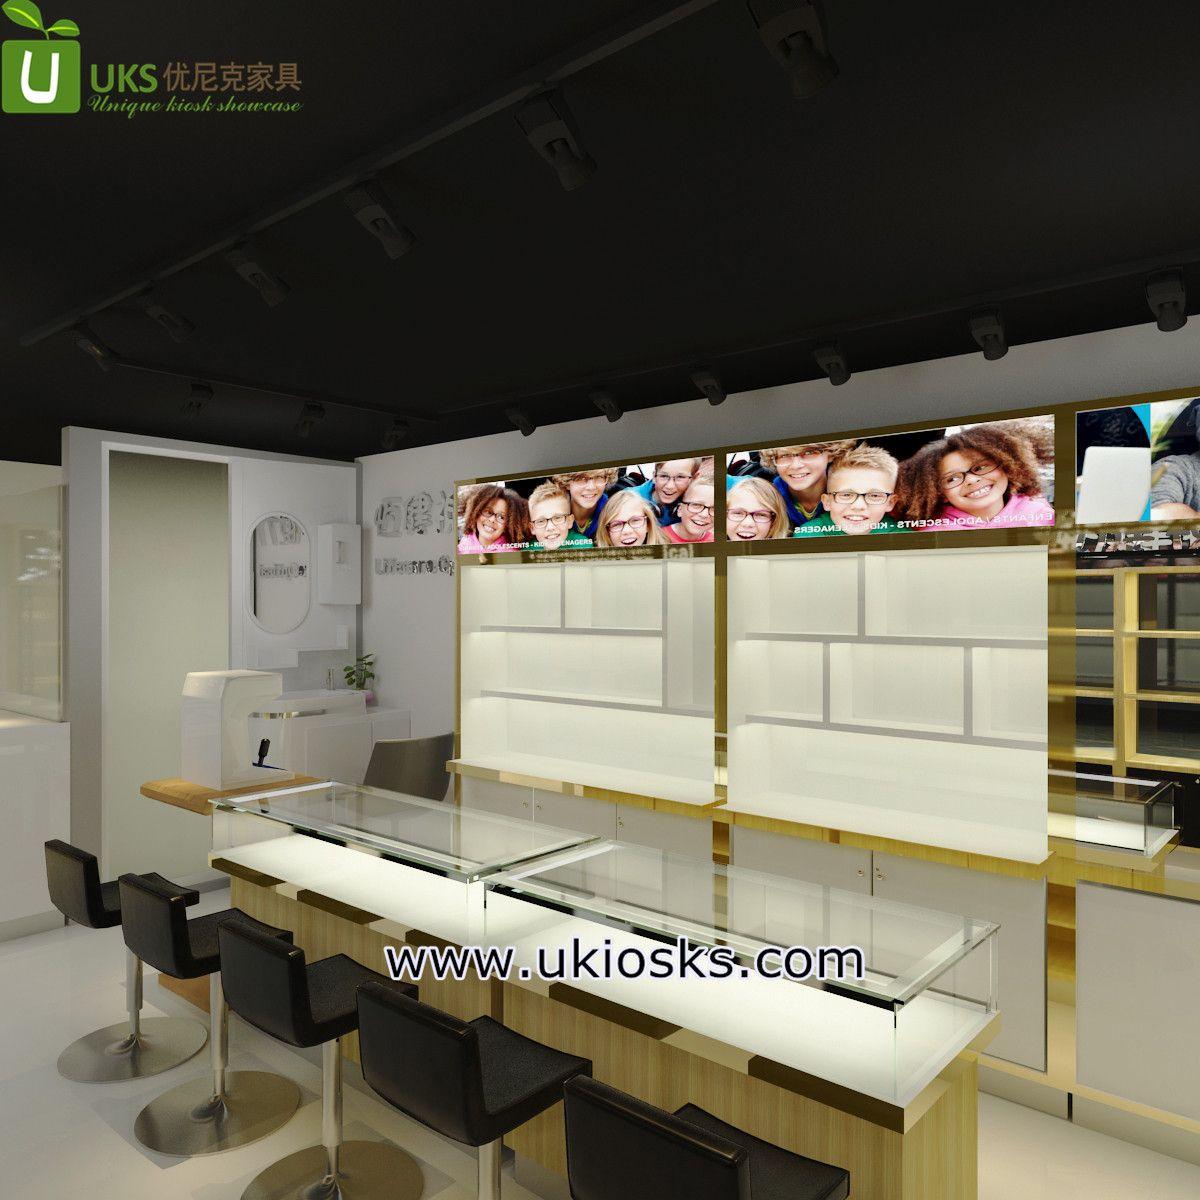 45c20451cac sunglass store interior design, optical shop design, display ...